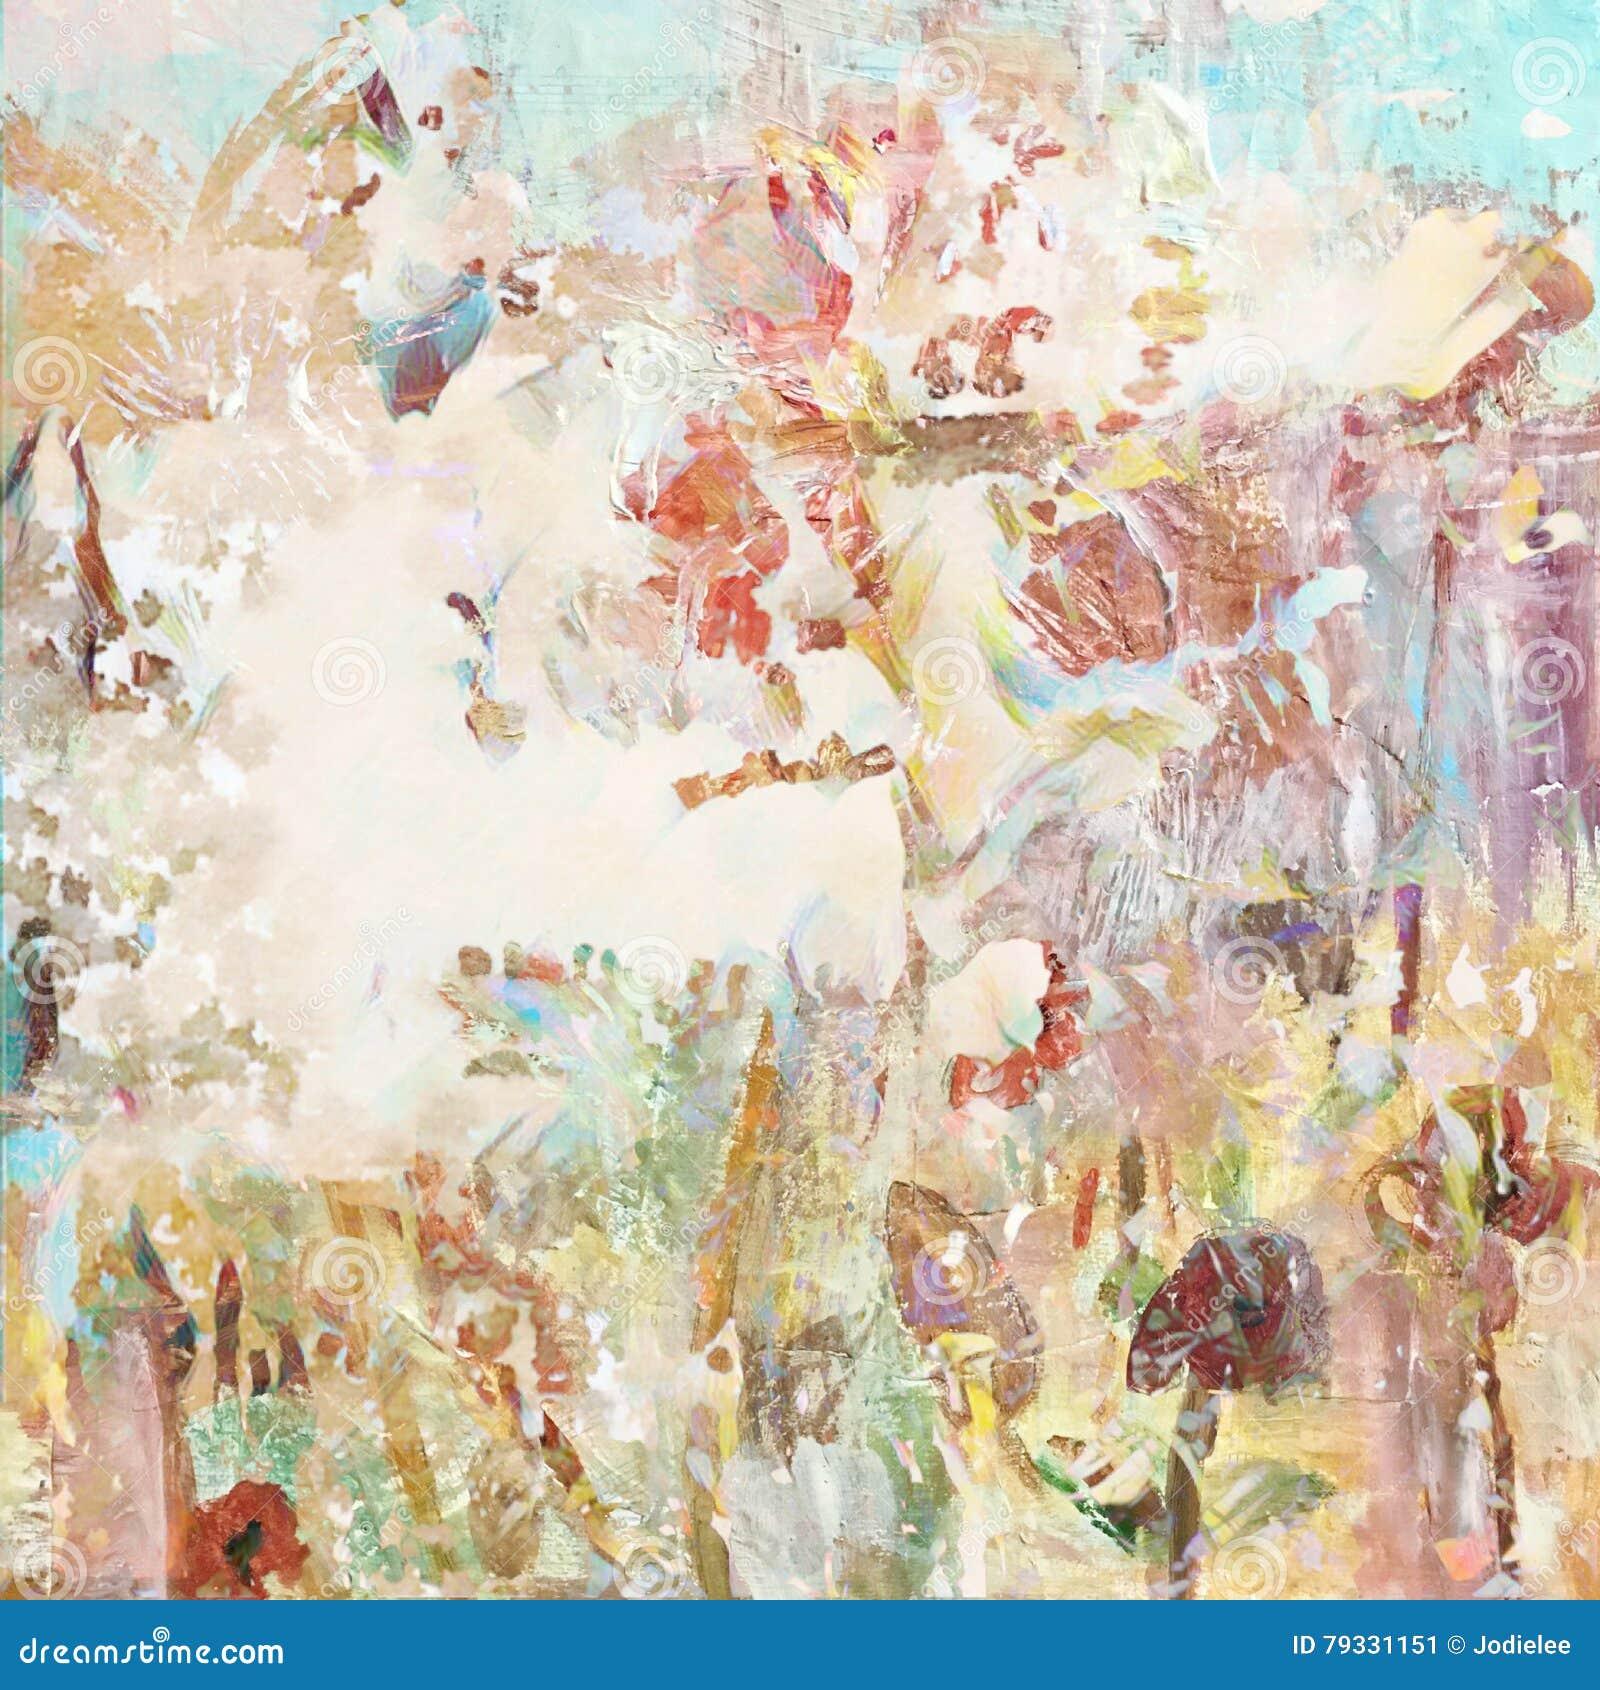 Gewaagde grungy verontruste artistieke geschilderde collageachtergrond